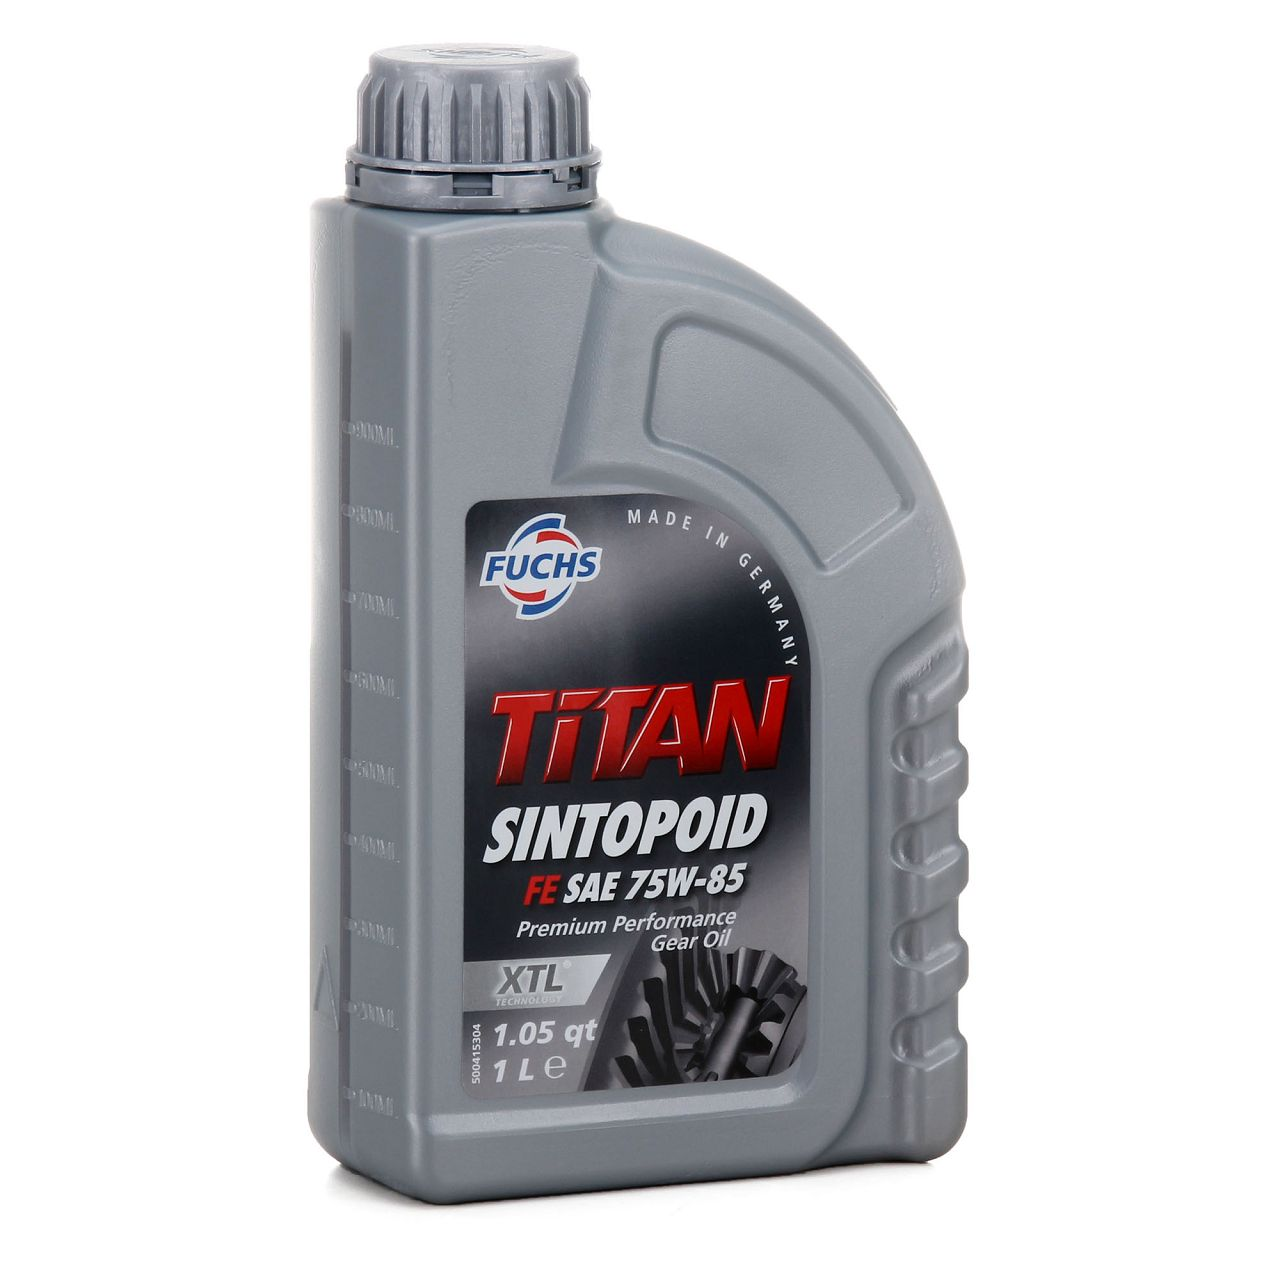 FUCHS Achsöl Achsgetriebeöl TITAN SINTOPOID FE SAE 75W-85 API GL-5 - 1 Liter